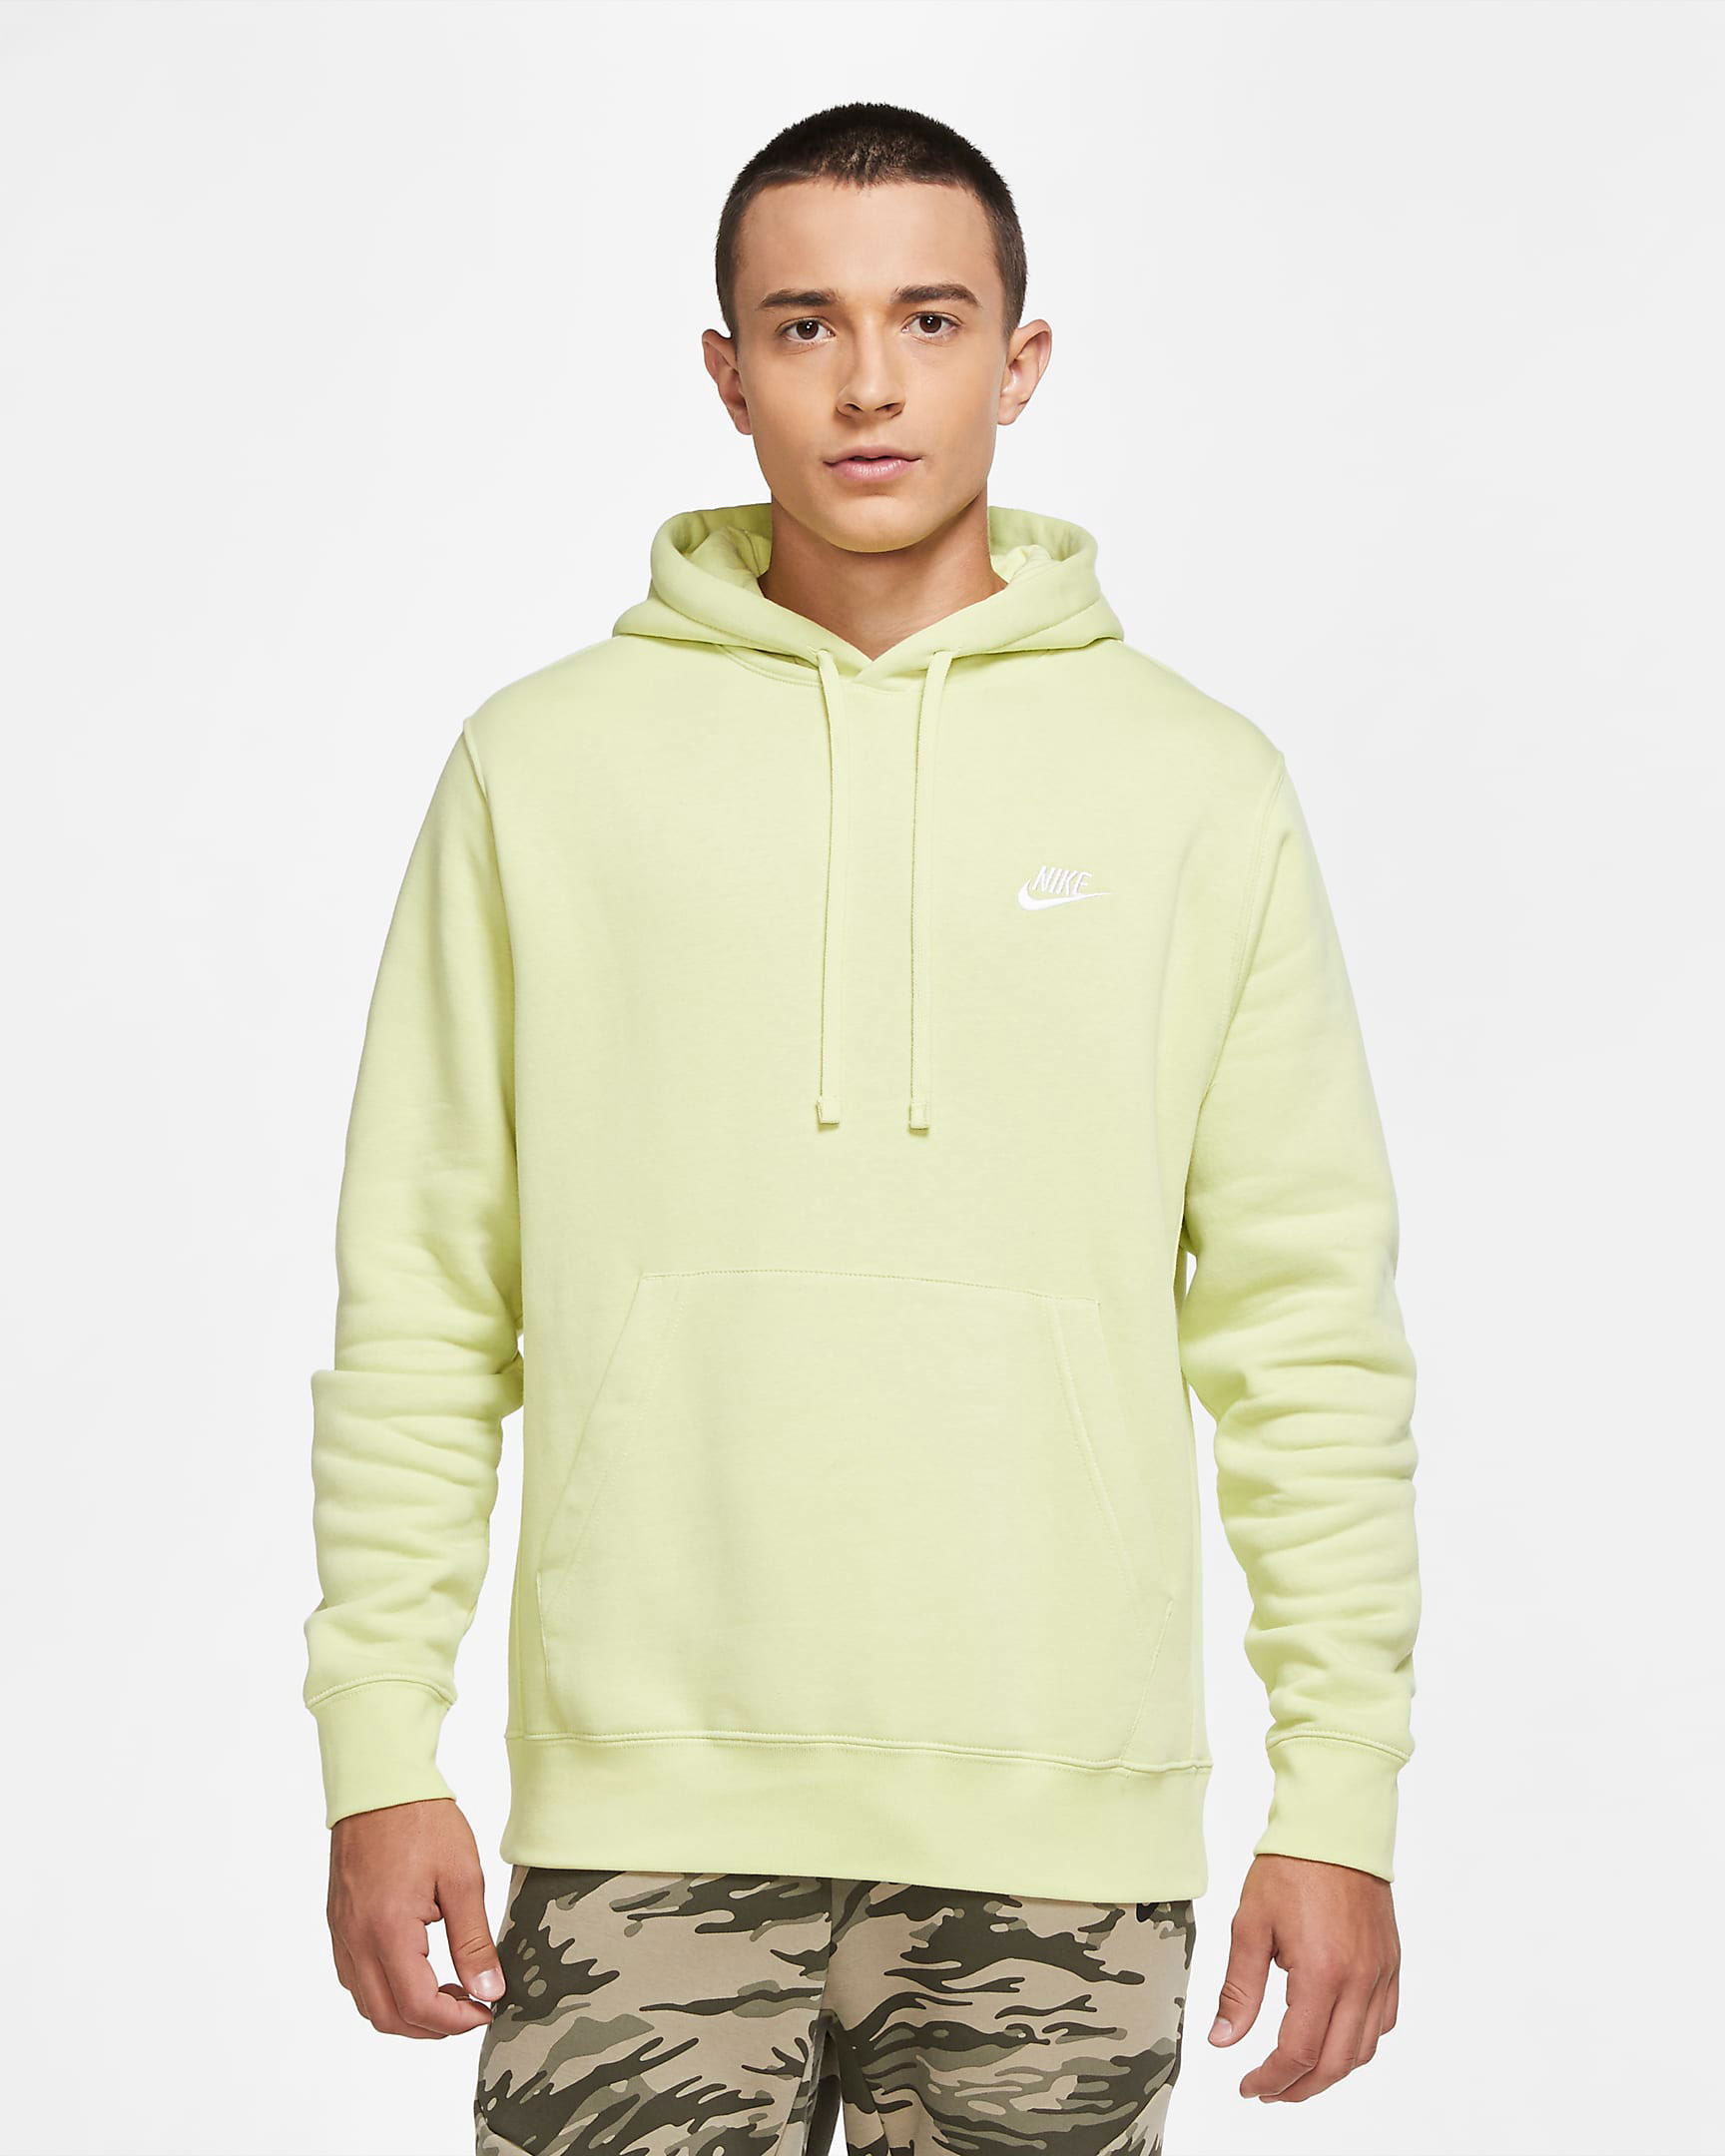 nike-air-max-95-neon-volt-hoodie-2